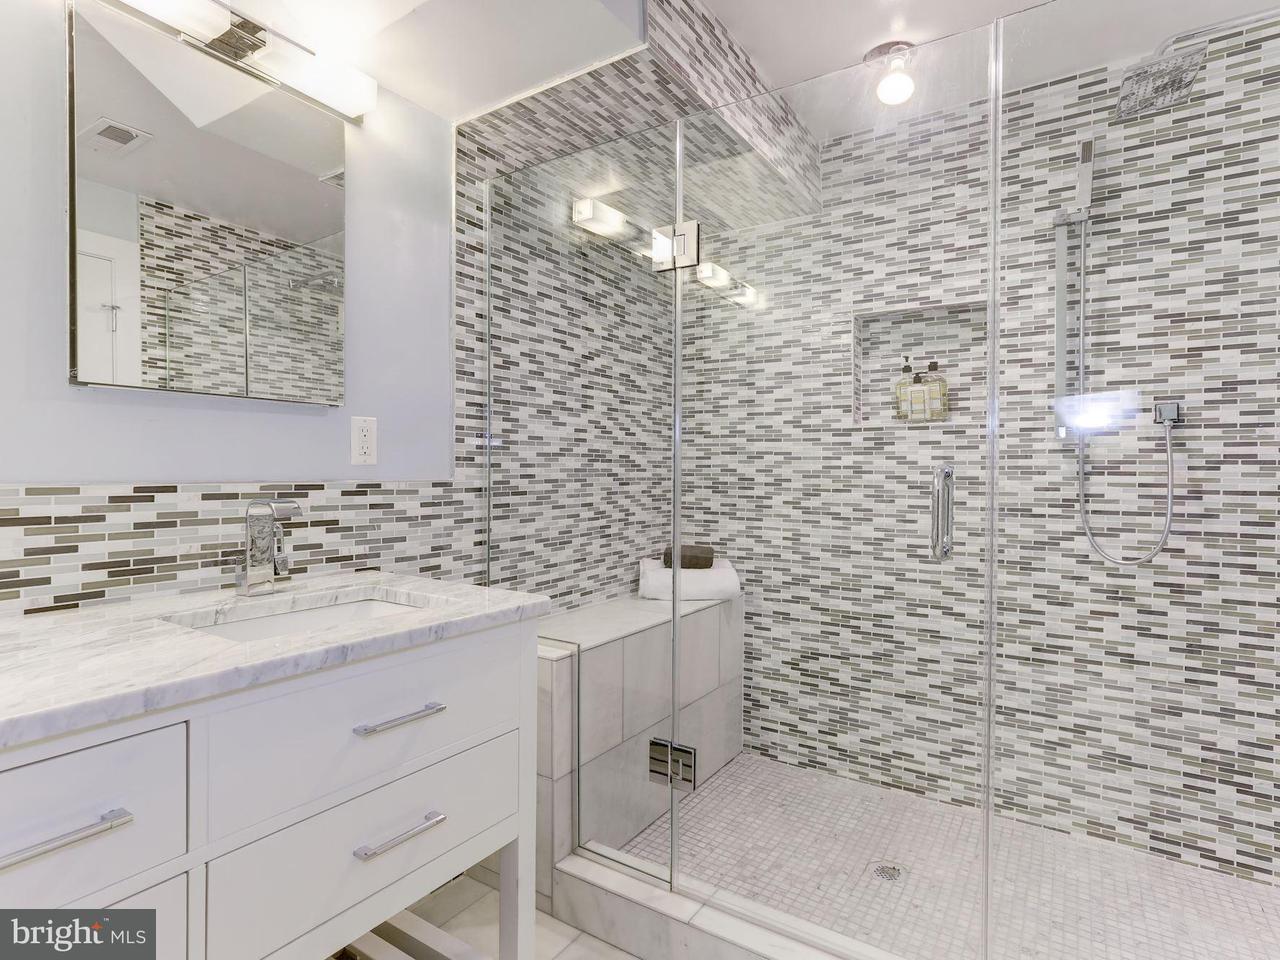 Additional photo for property listing at 411 Ridge St Nw #1 411 Ridge St Nw #1 华盛顿市, 哥伦比亚特区 20001 美国